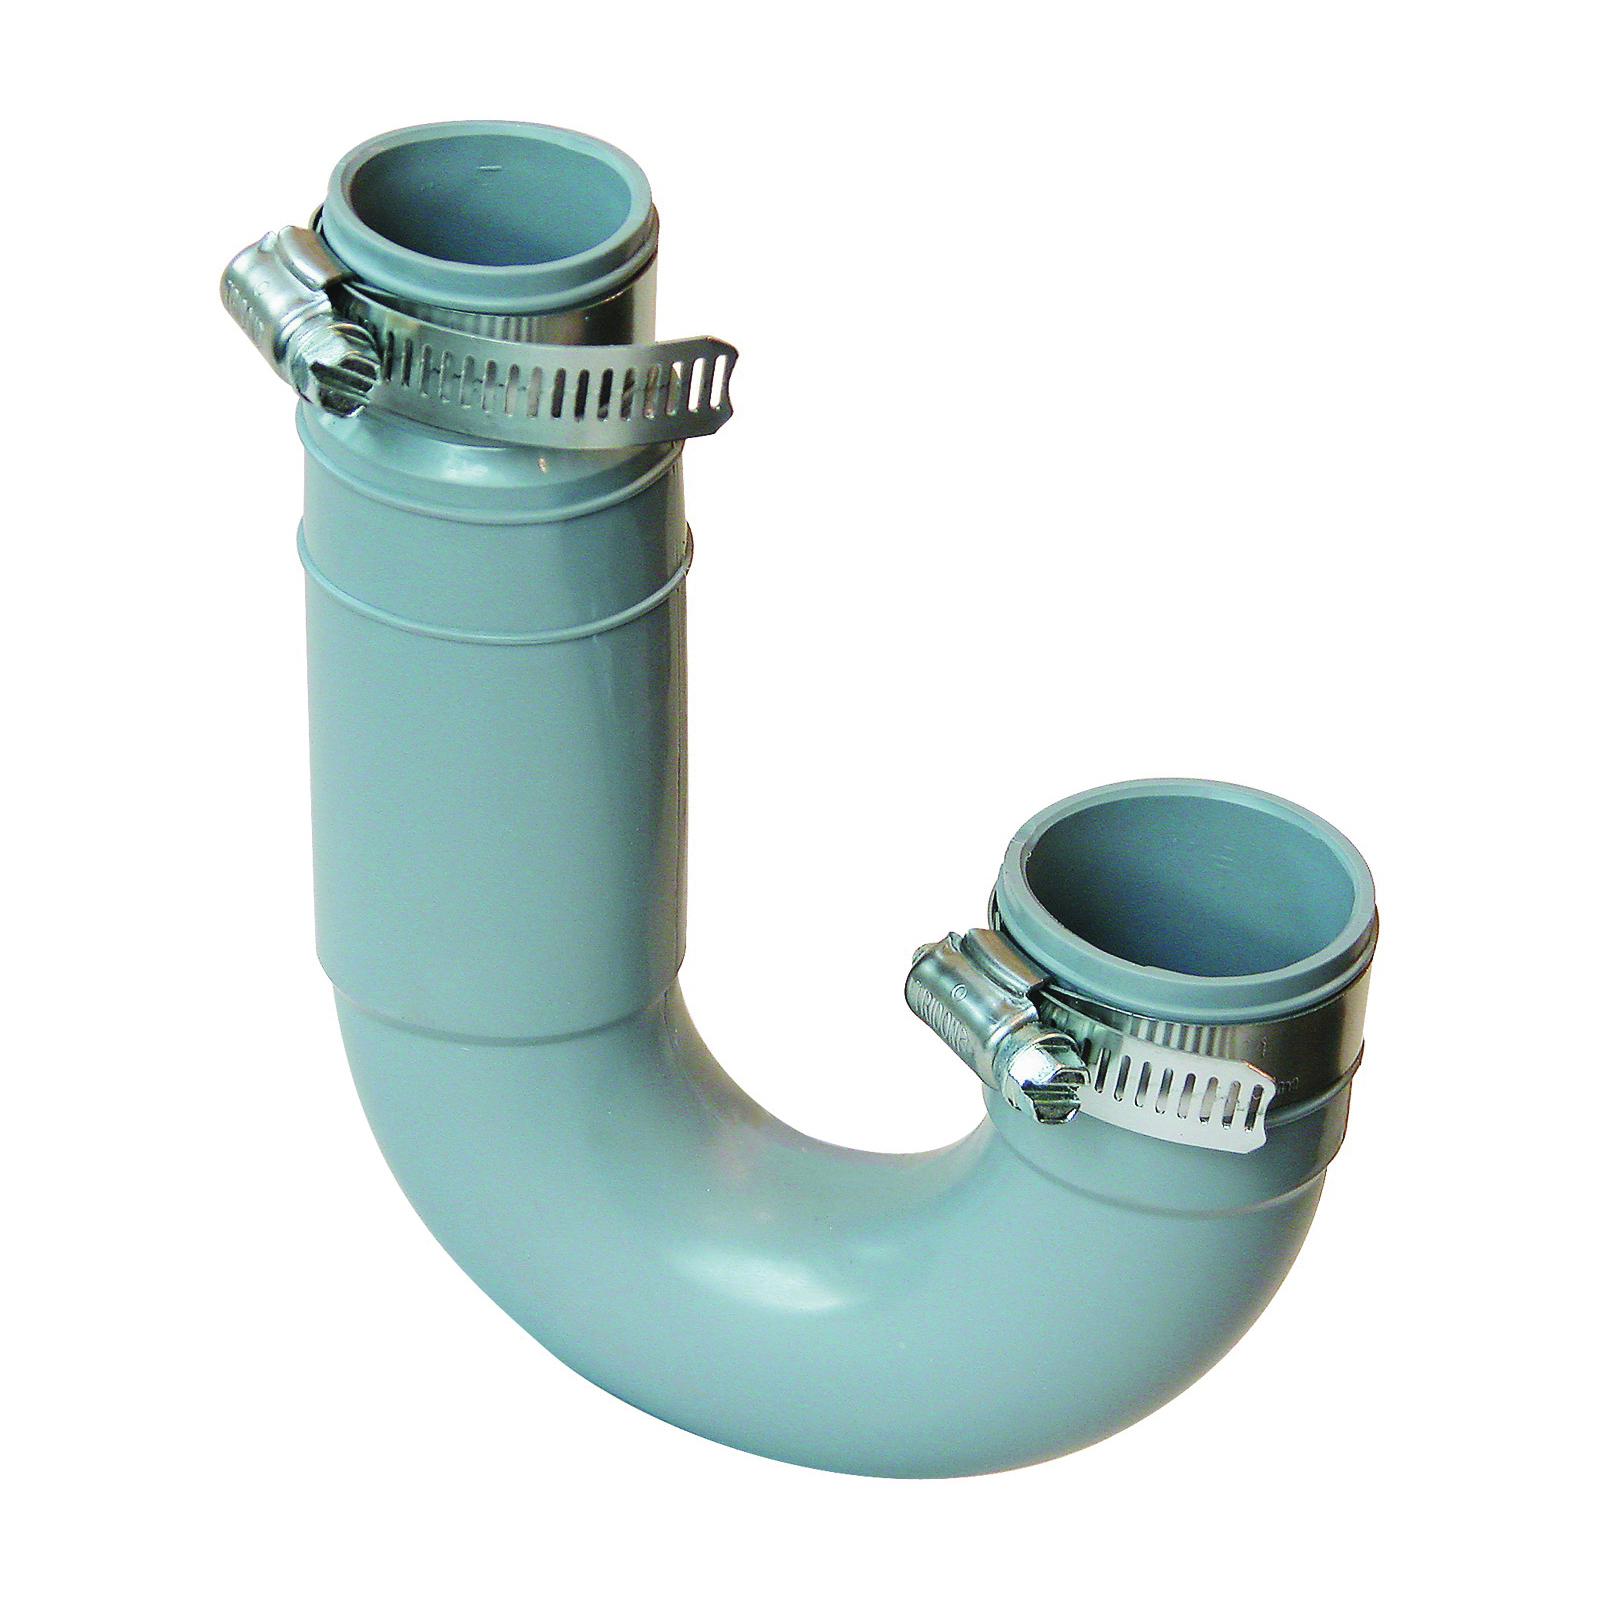 Picture of FERNCO PFT-150 Flexible Qwik Trap, 1-1/4 x 1-1/2 in, PVC, Black, 4.3 psi Pressure